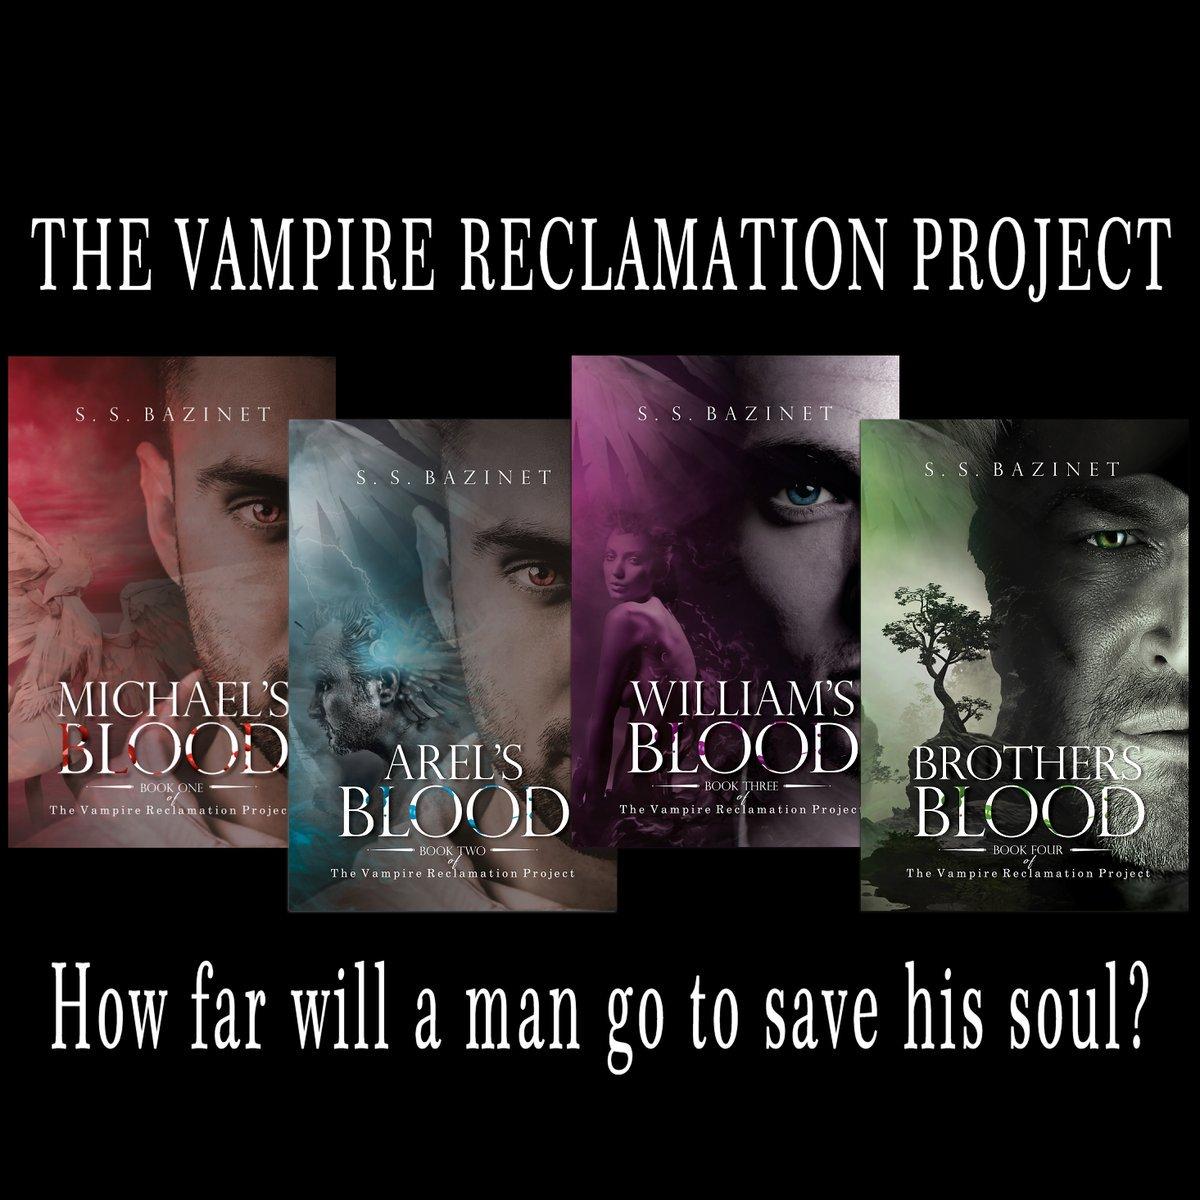 THE VAMPIRE RECLAMATION PROJECT (4 Book Series)  https://www. amazon.com/gp/product/B01 KVJWM6O/ &nbsp; …  … … by @SSBazinet  FREE on #KindleUnlimited #Fantasy #IARTG #IAN1<br>http://pic.twitter.com/4Mt6pEetfS